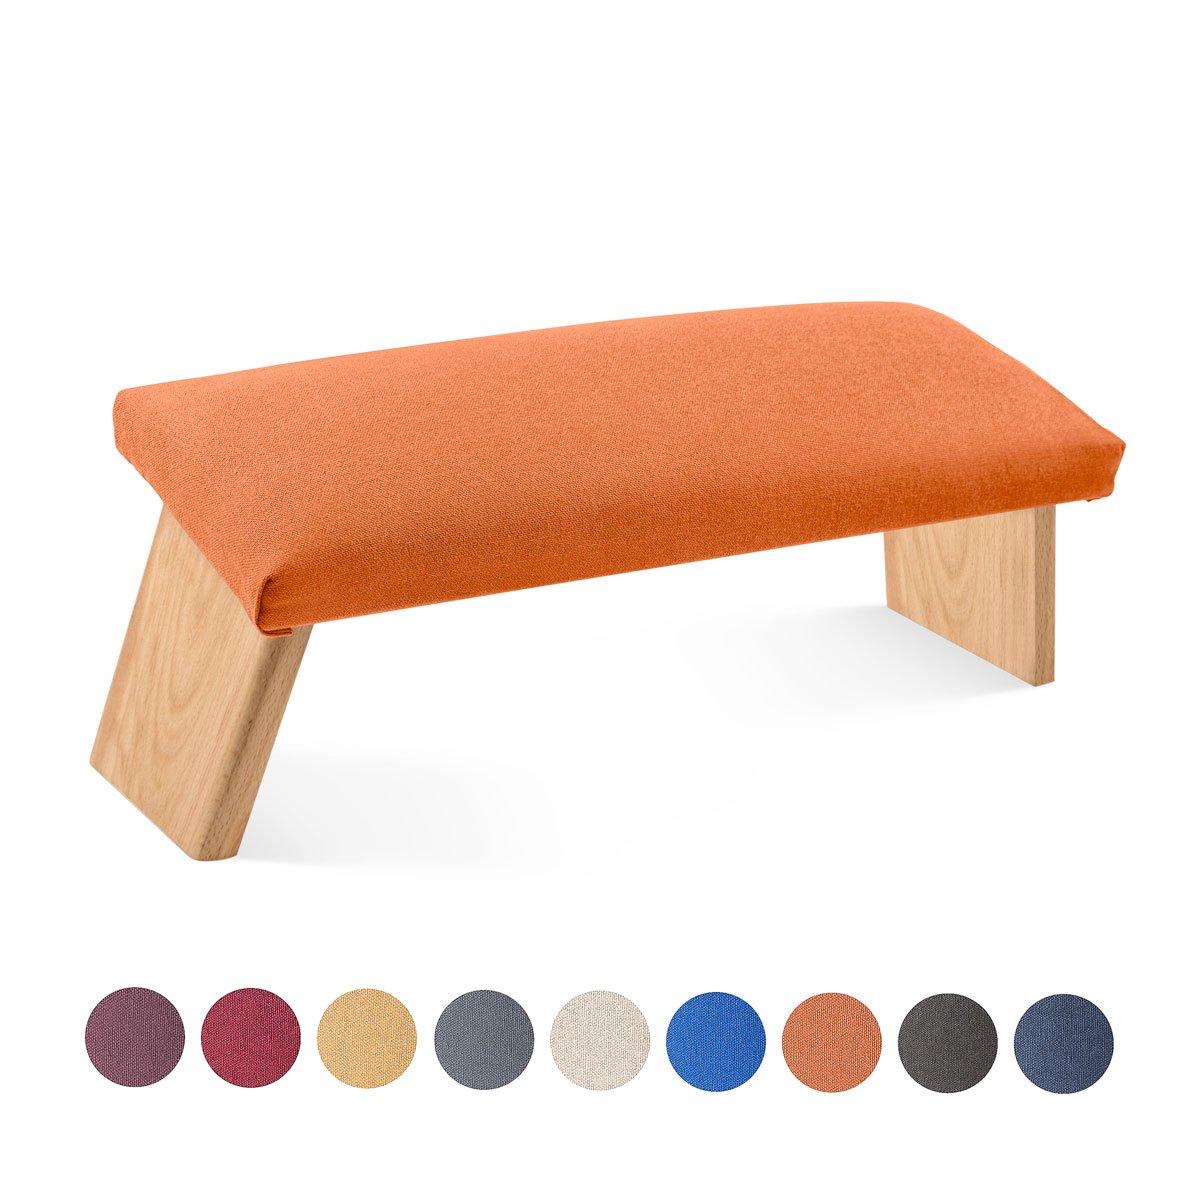 Lotuscrafts Meditationsbank Dharma inkl. gepolsterte Sitzfläche mit Bezug, klappbar